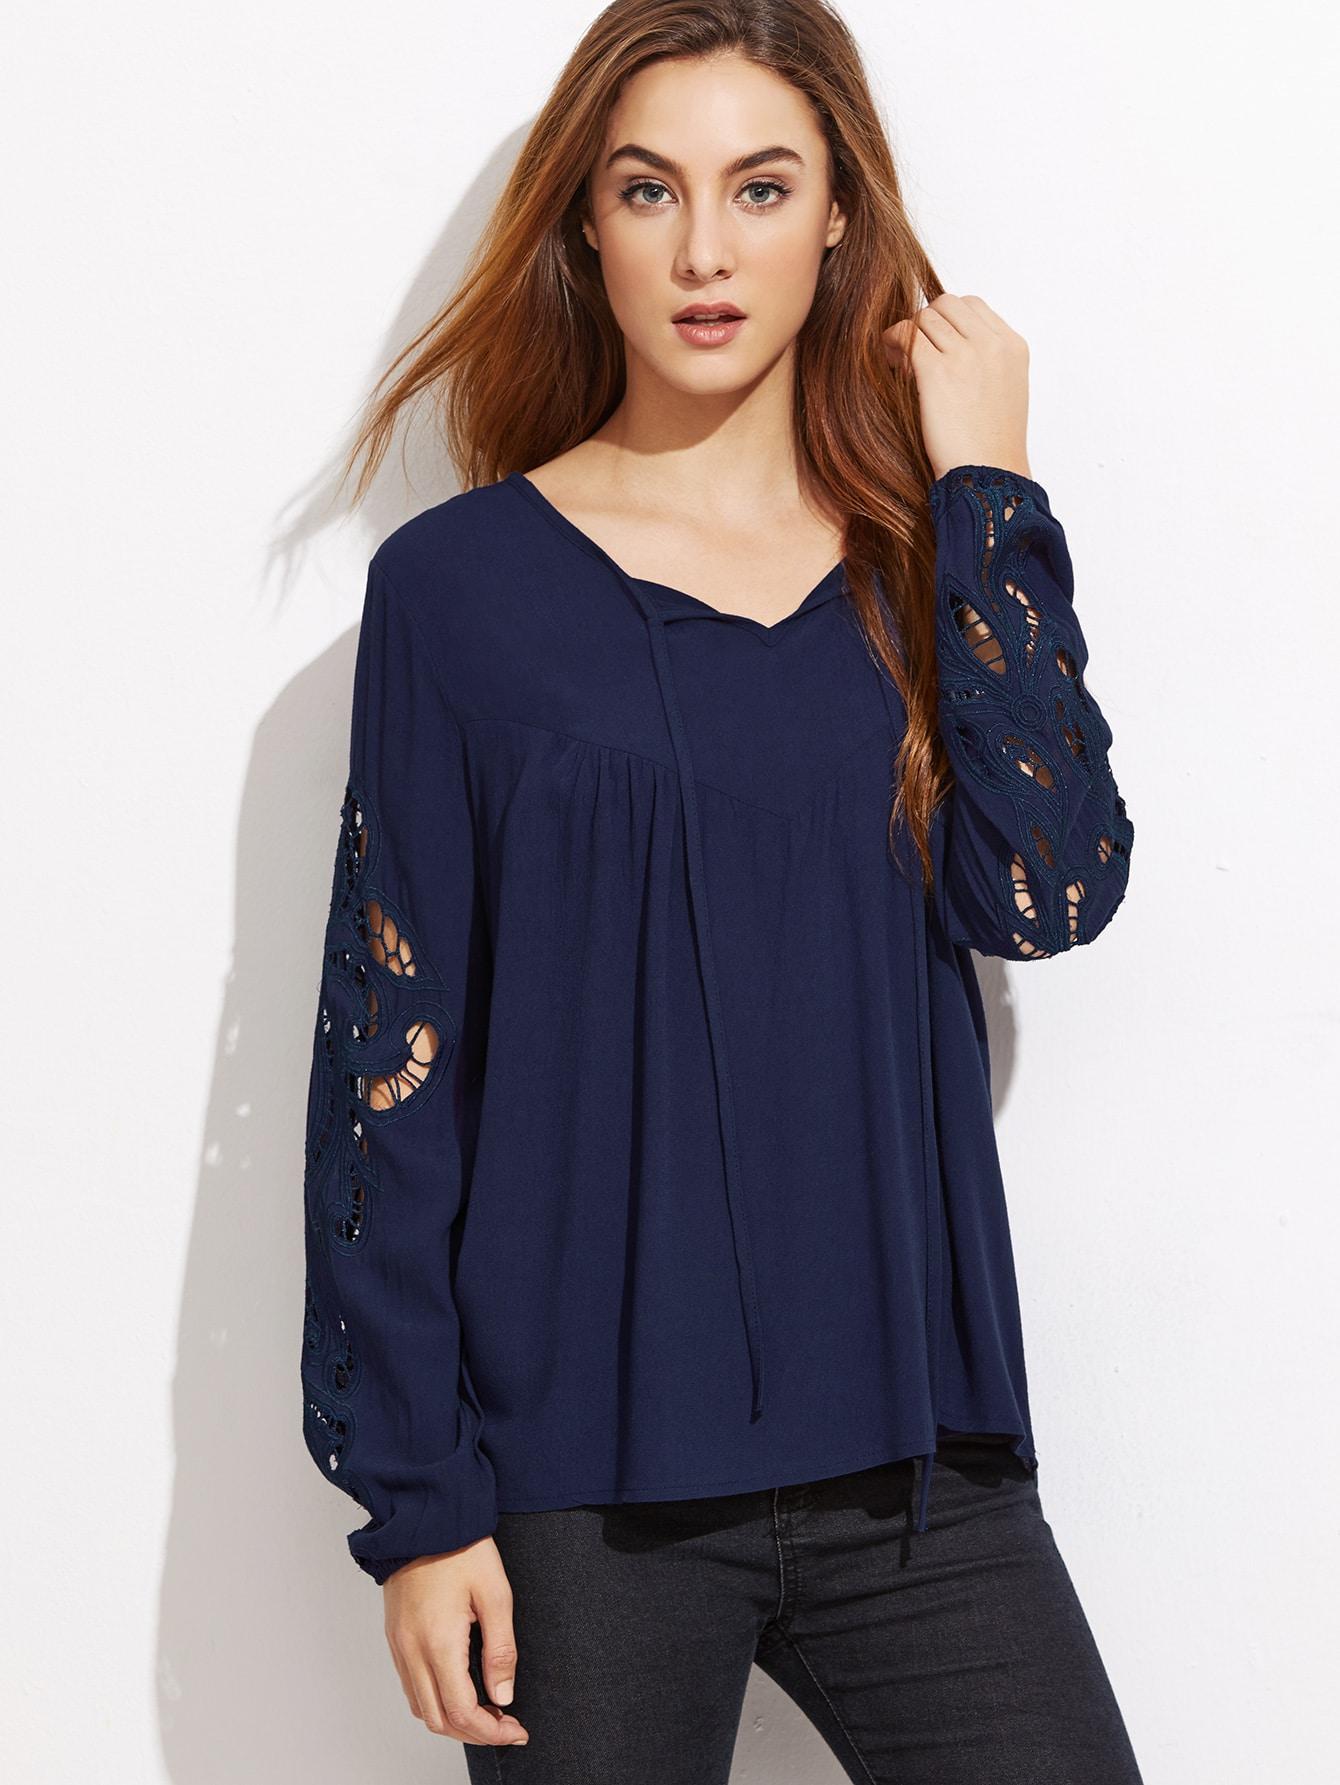 blouse161013003_2